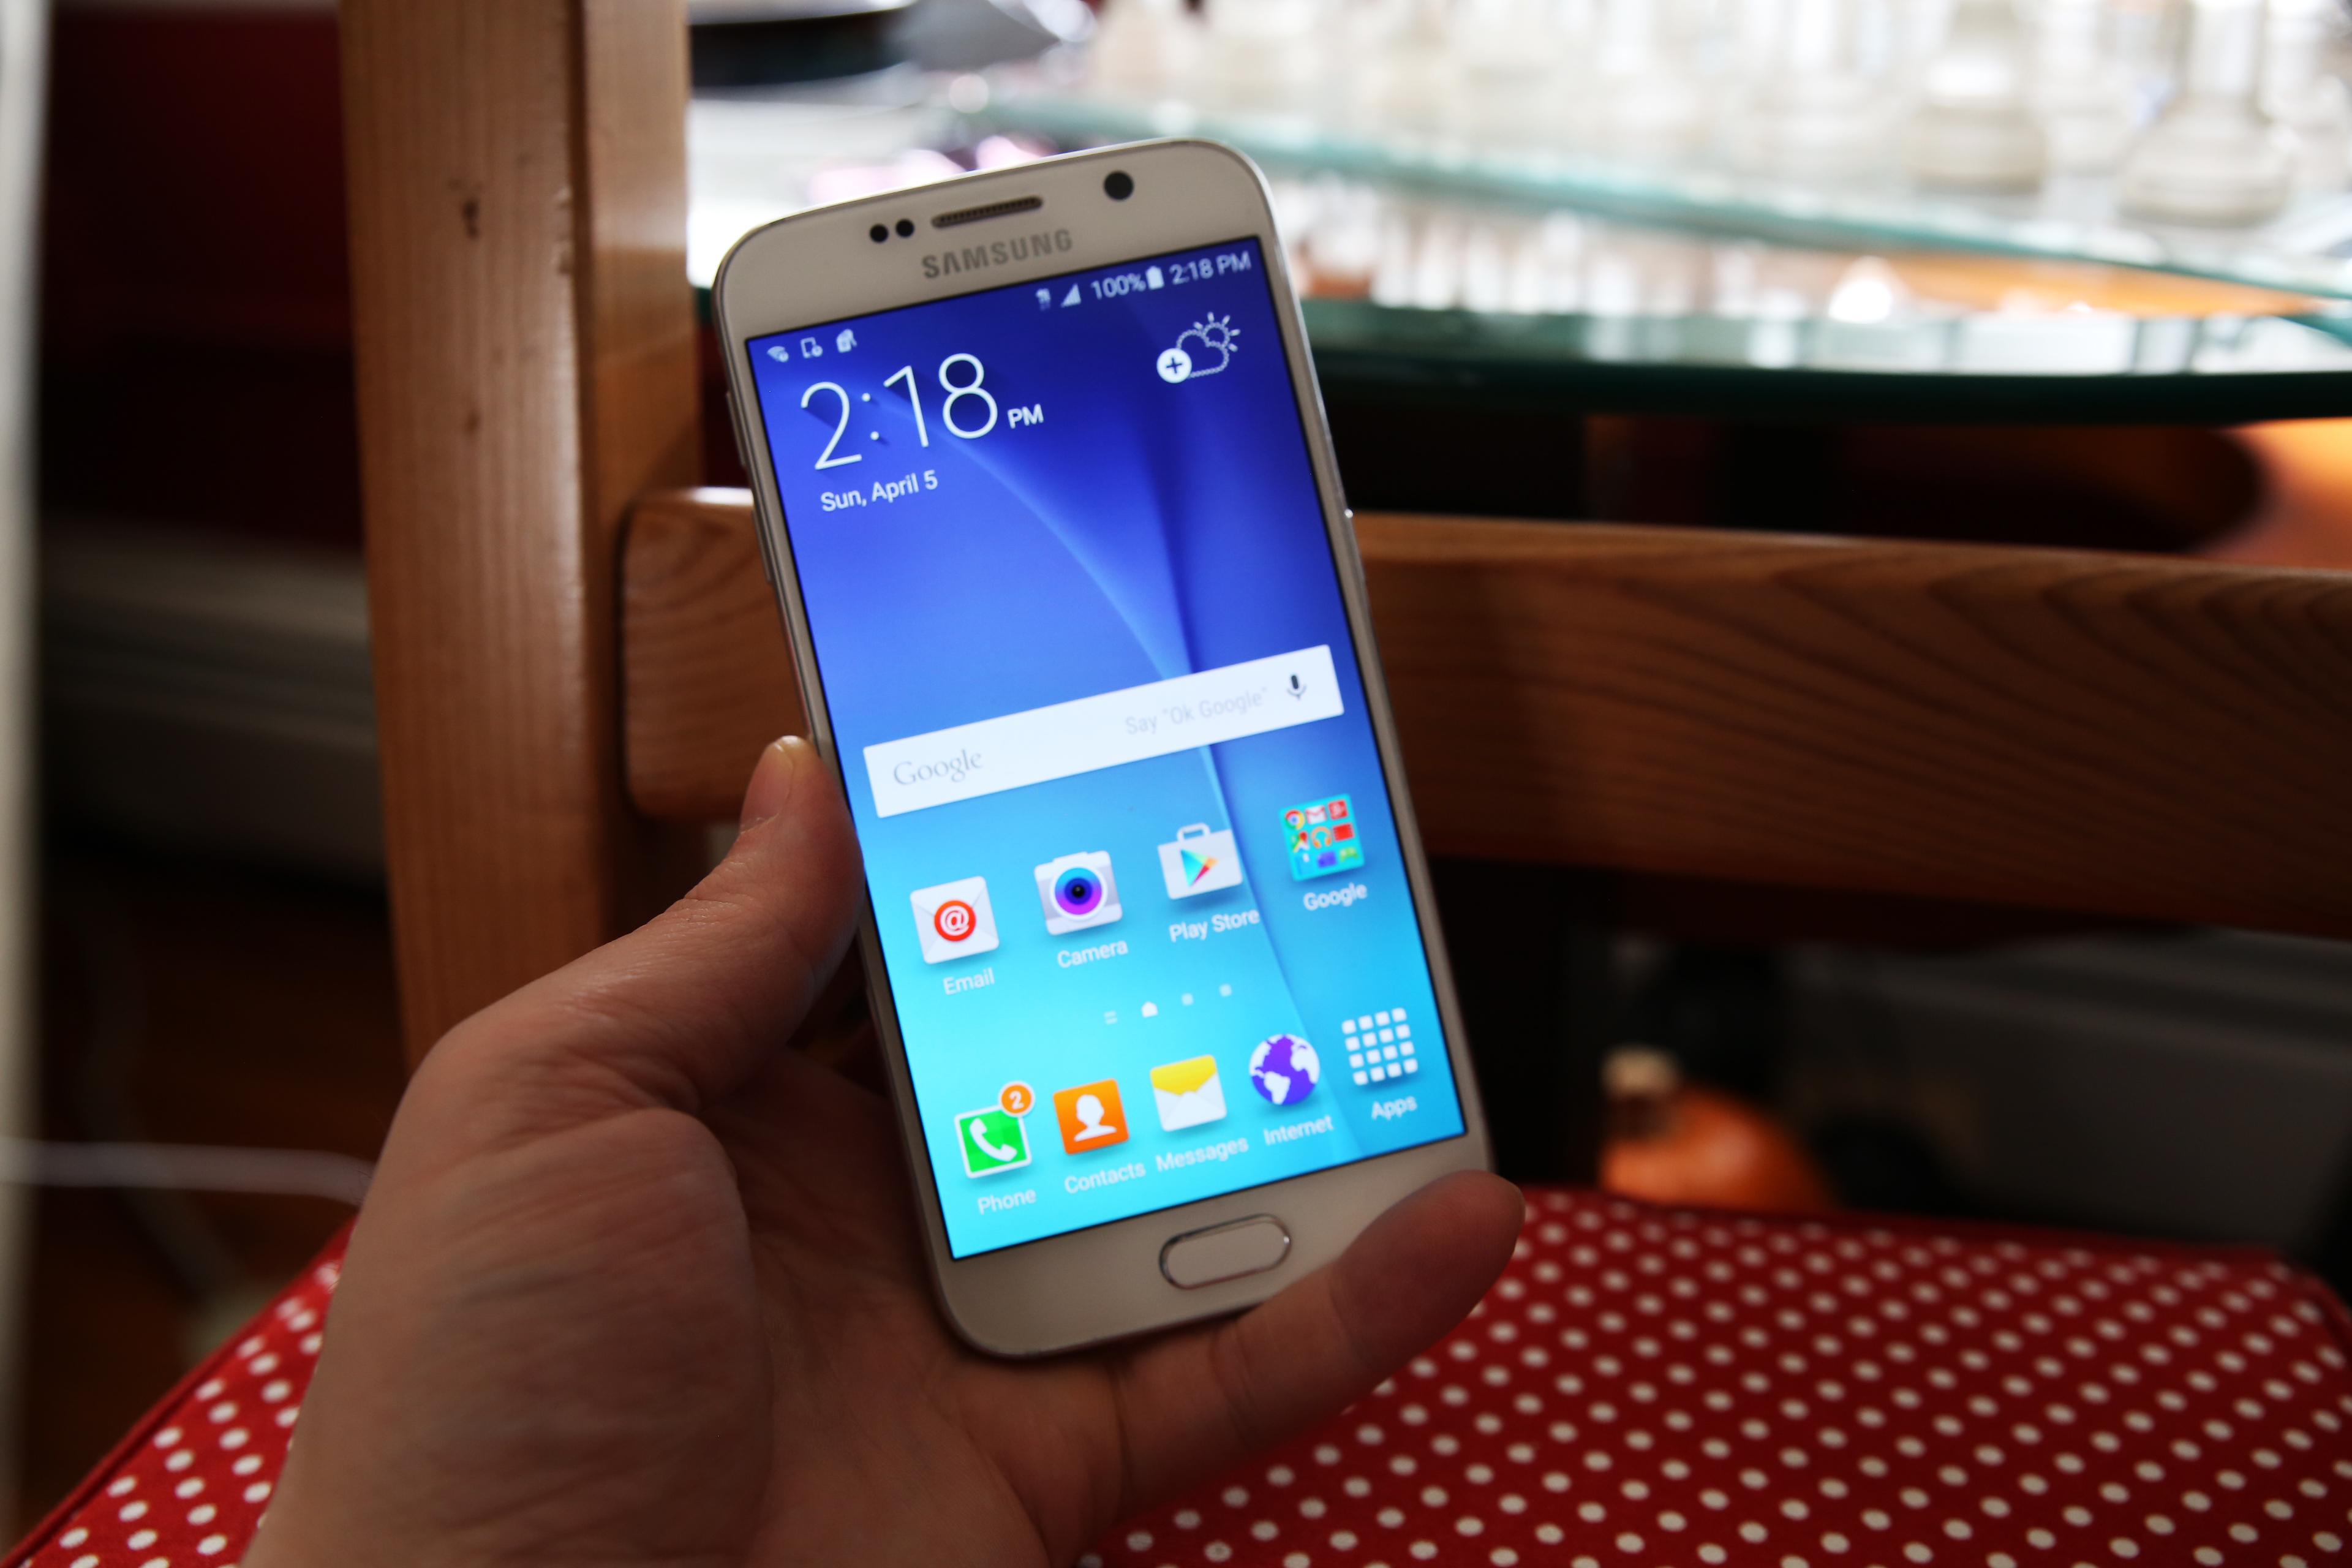 Verizon's Bringing Wi-Fi Calling To Select Samsung Phones Next Week